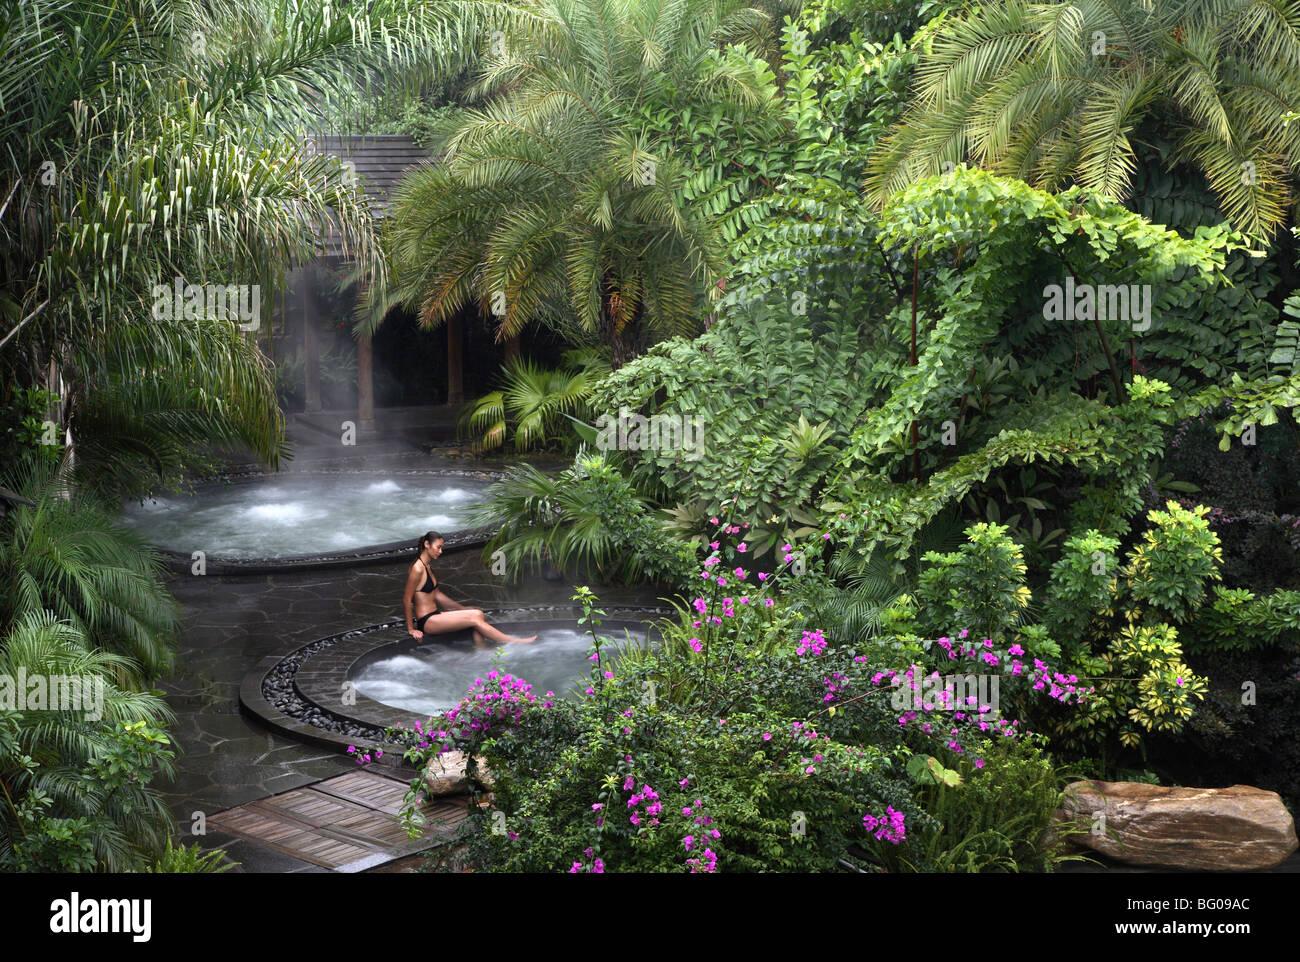 Hot spring pool at the brilliant resort and spa in kunming yunnan province china asia